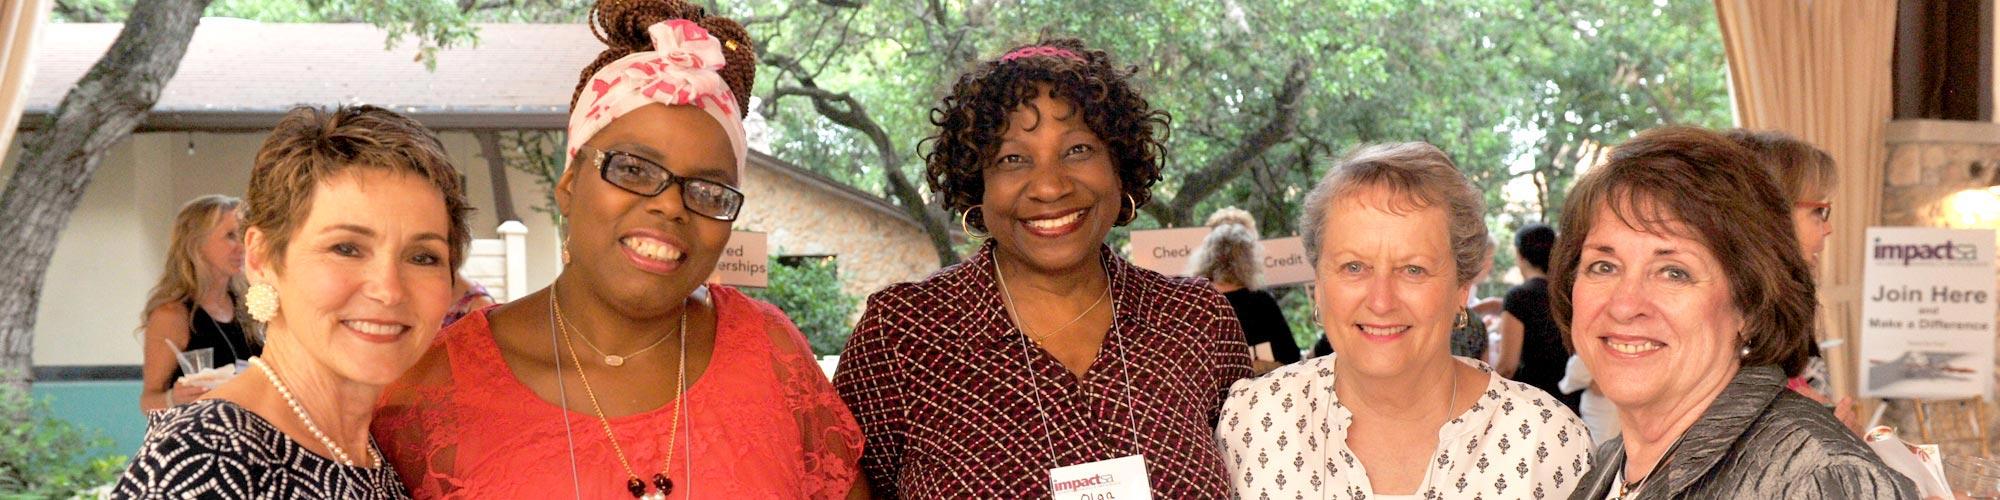 Members of Impact SA and Grant Recipients